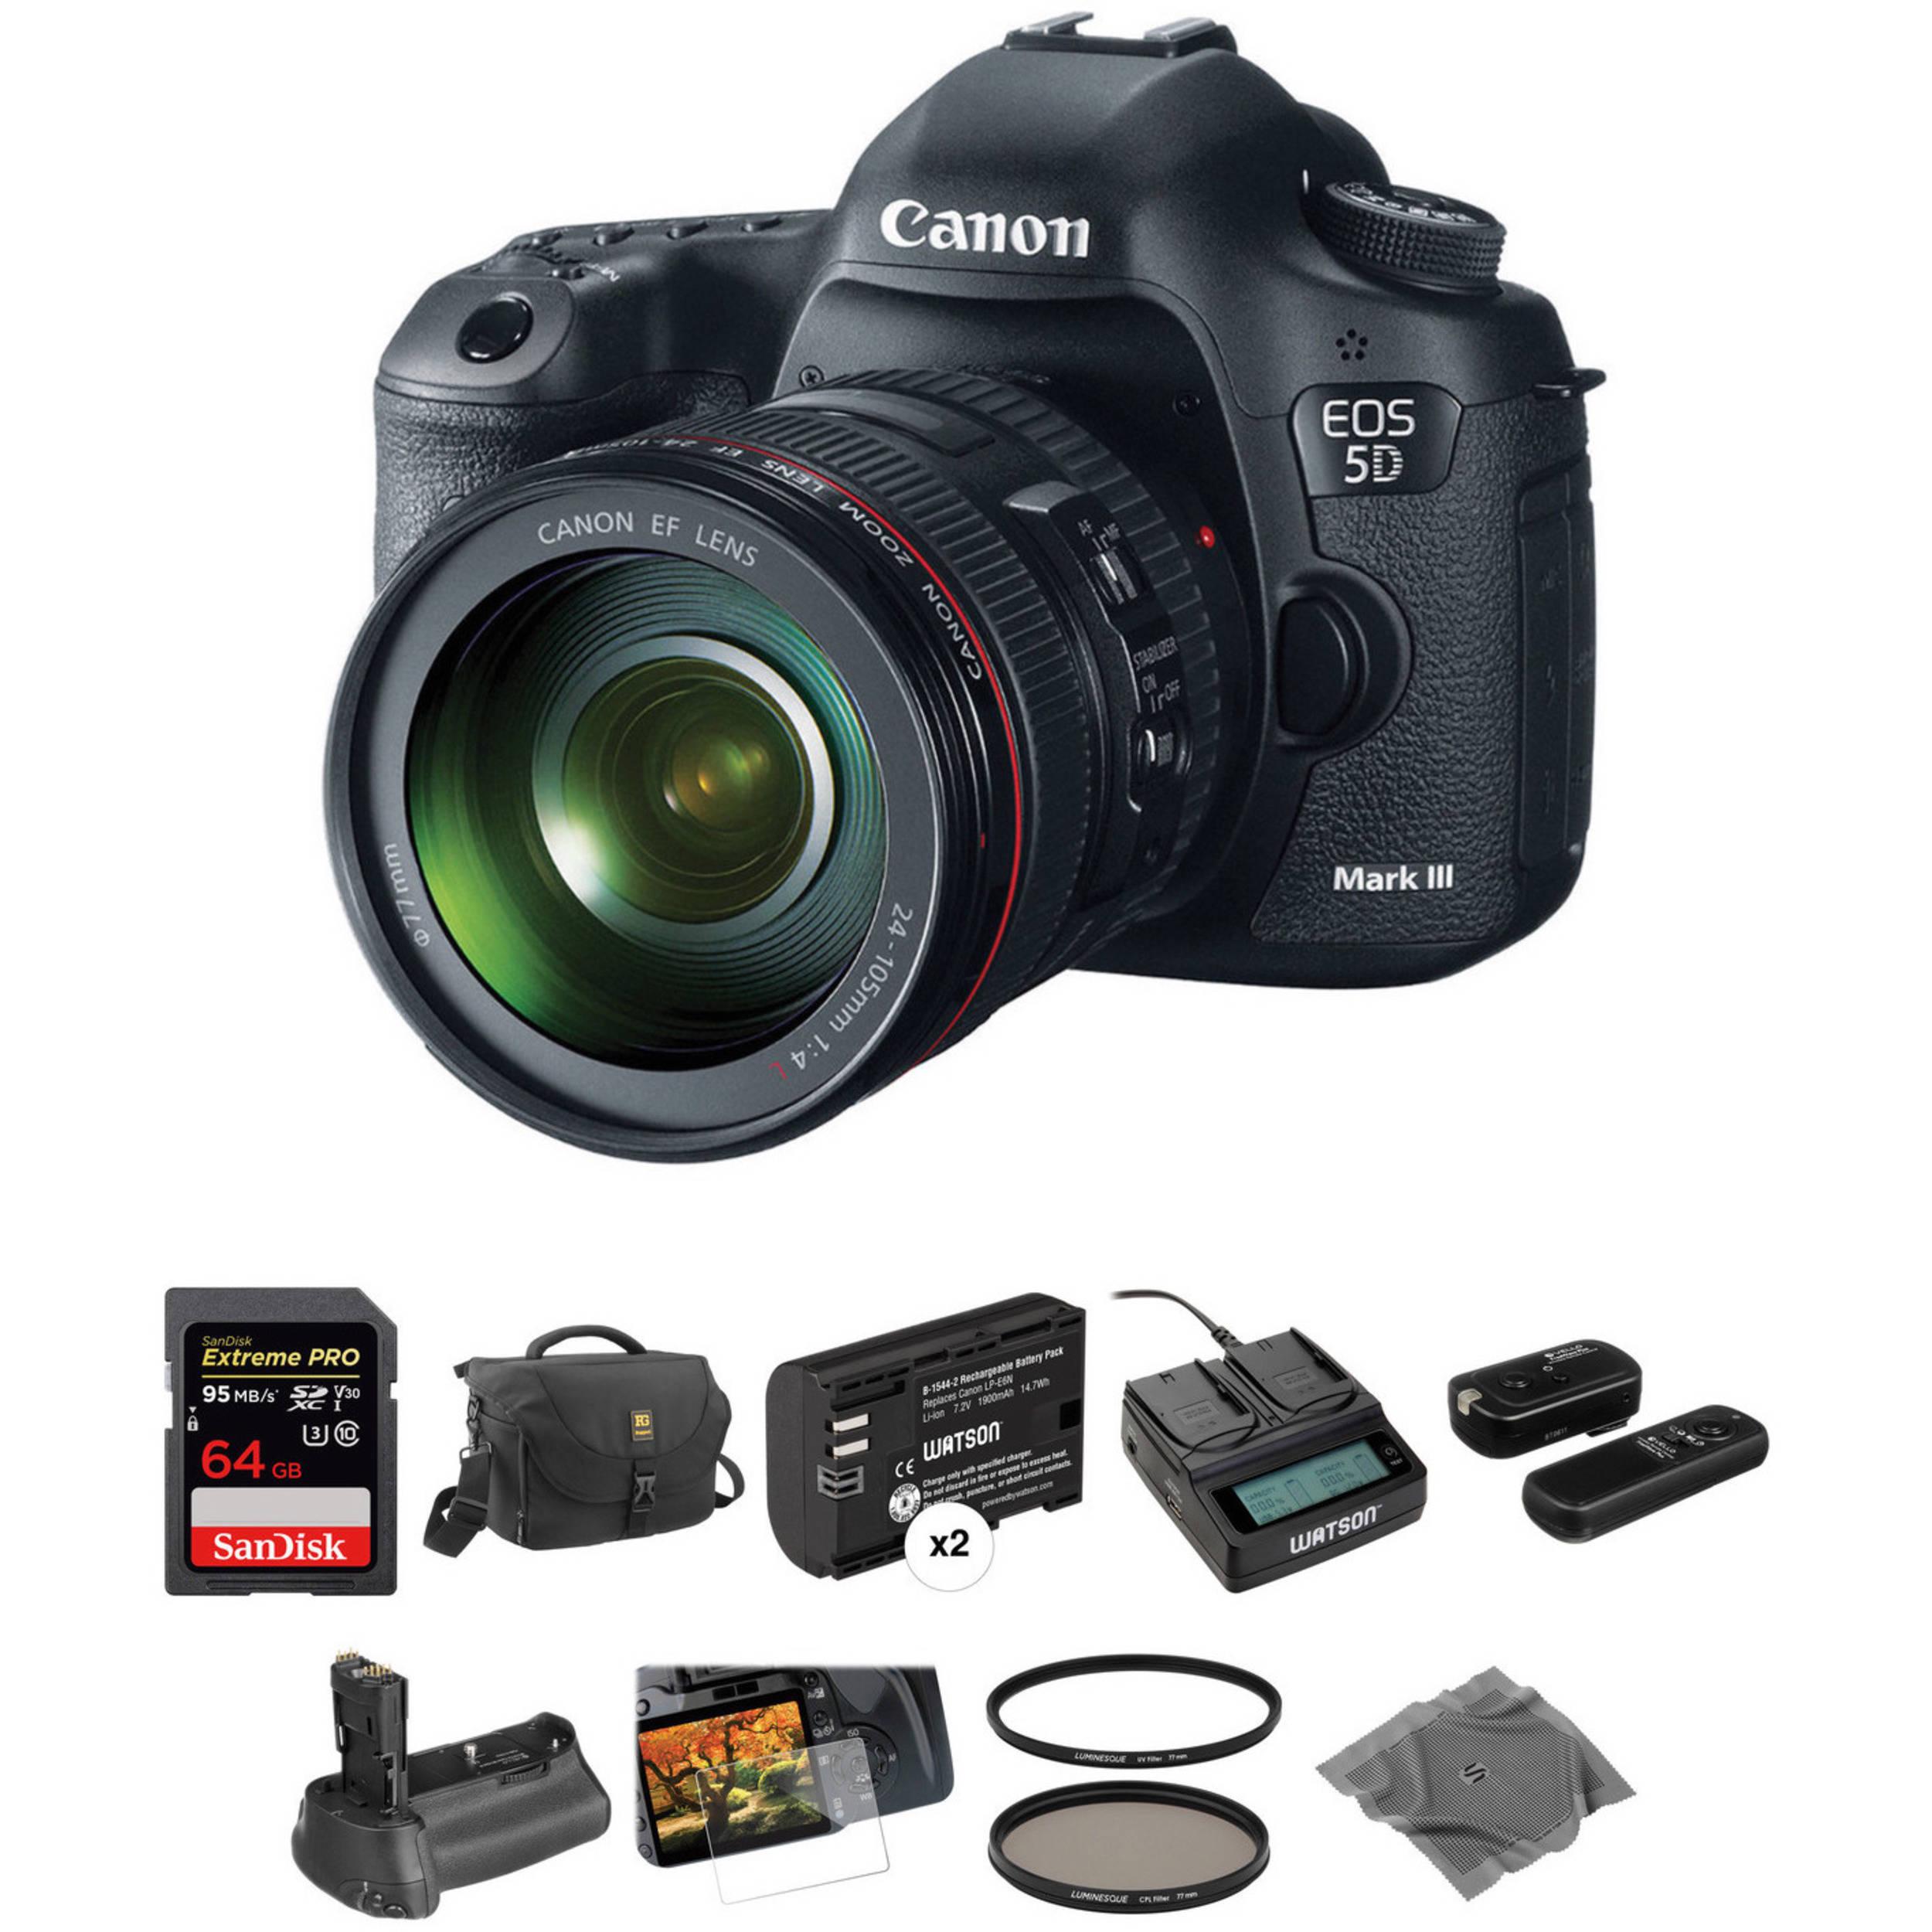 canon eos 5d mark iii dslr camera with 24 105mm f 4l lens b h. Black Bedroom Furniture Sets. Home Design Ideas